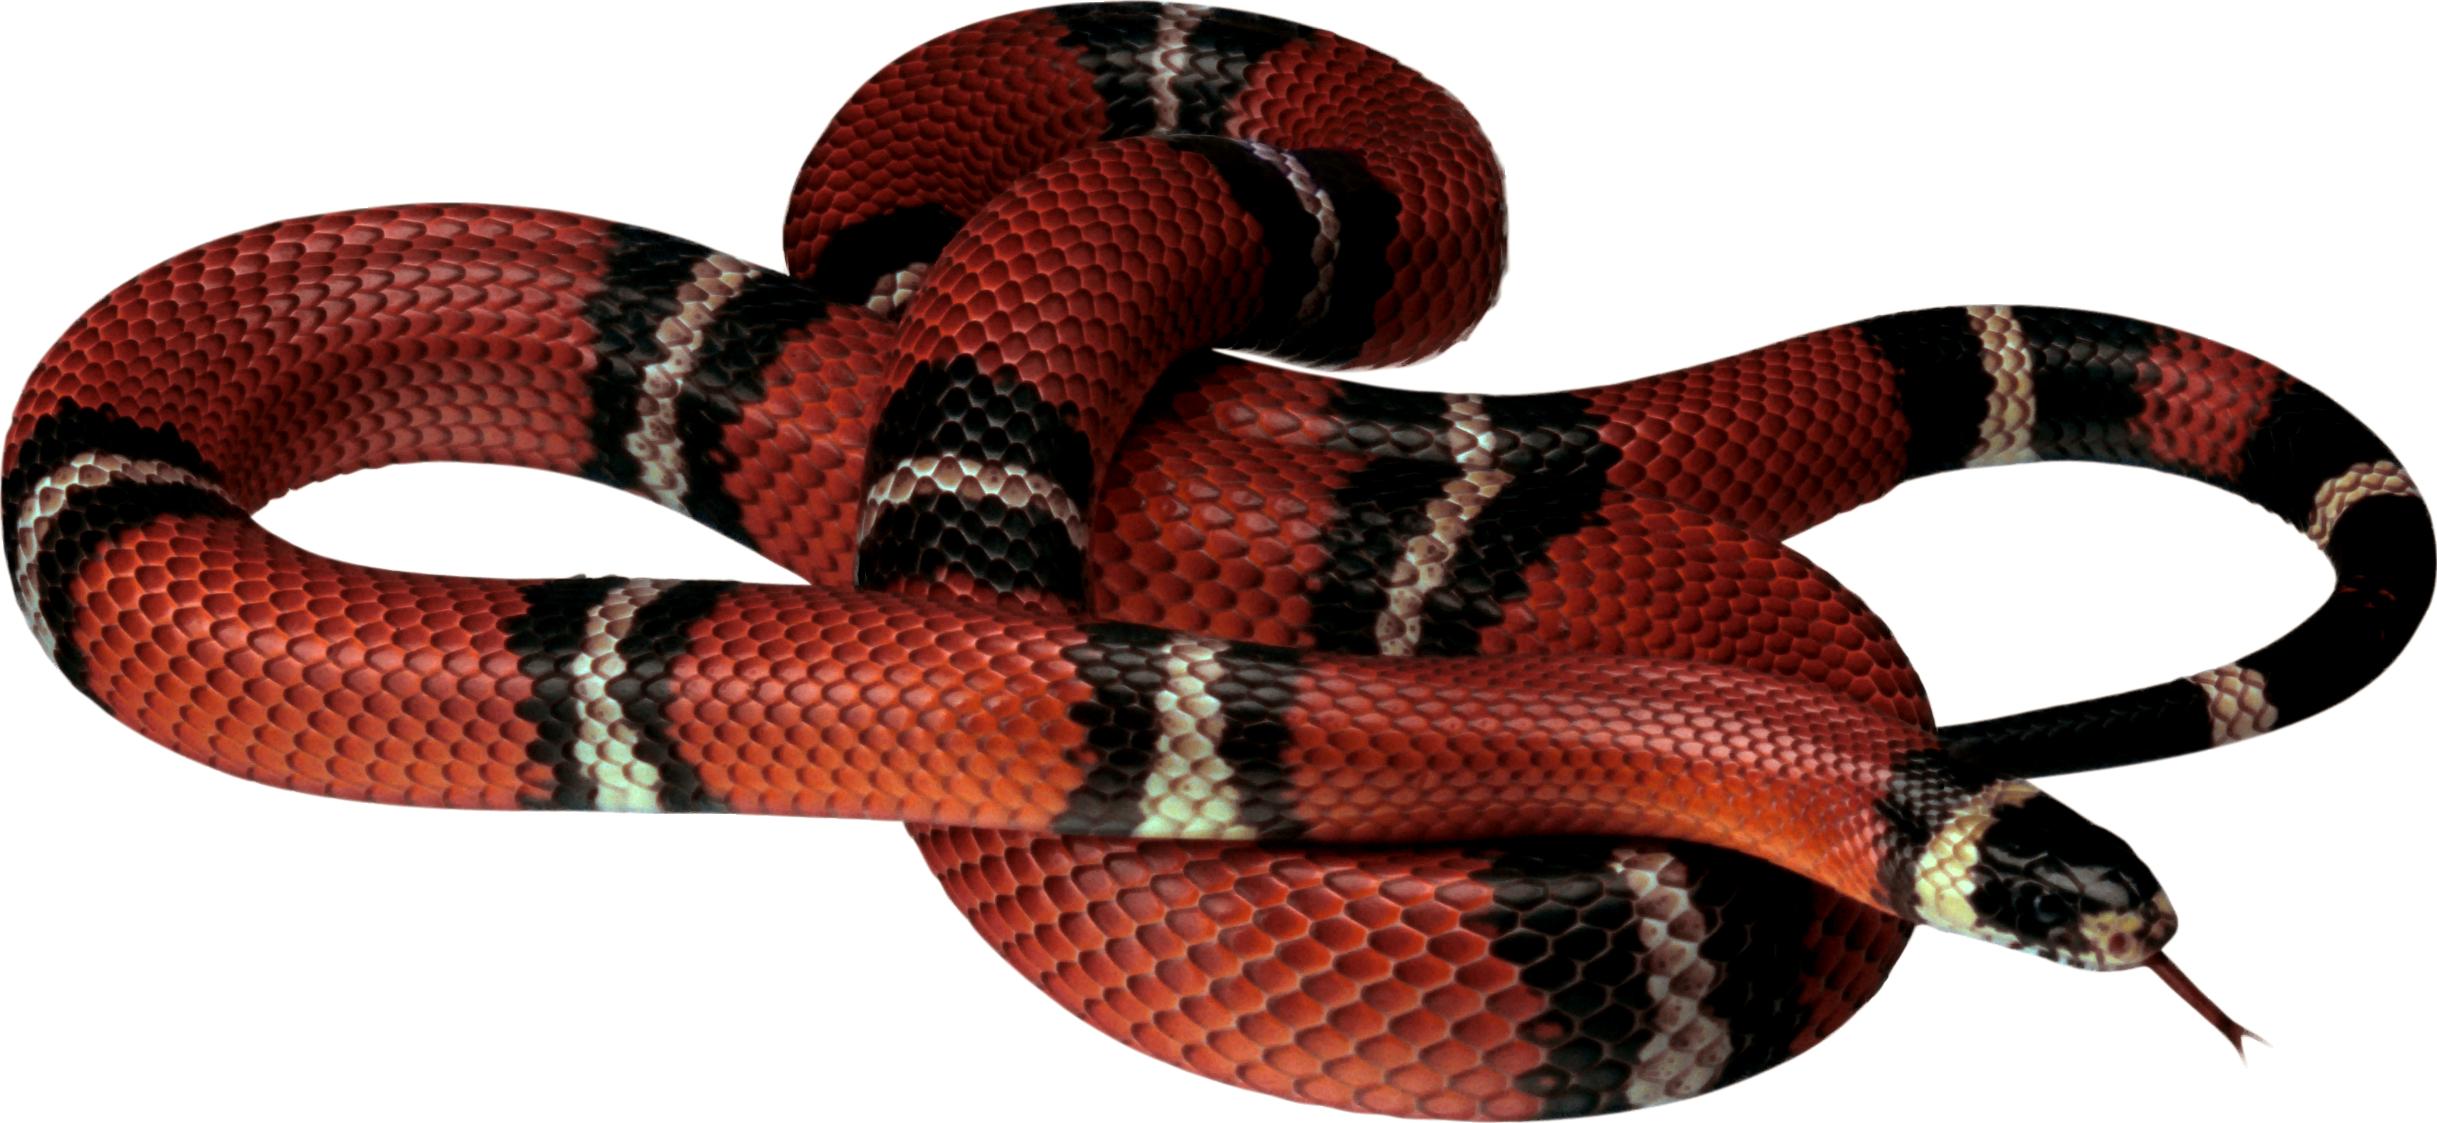 Png pinterest. Snake clipart forest animal